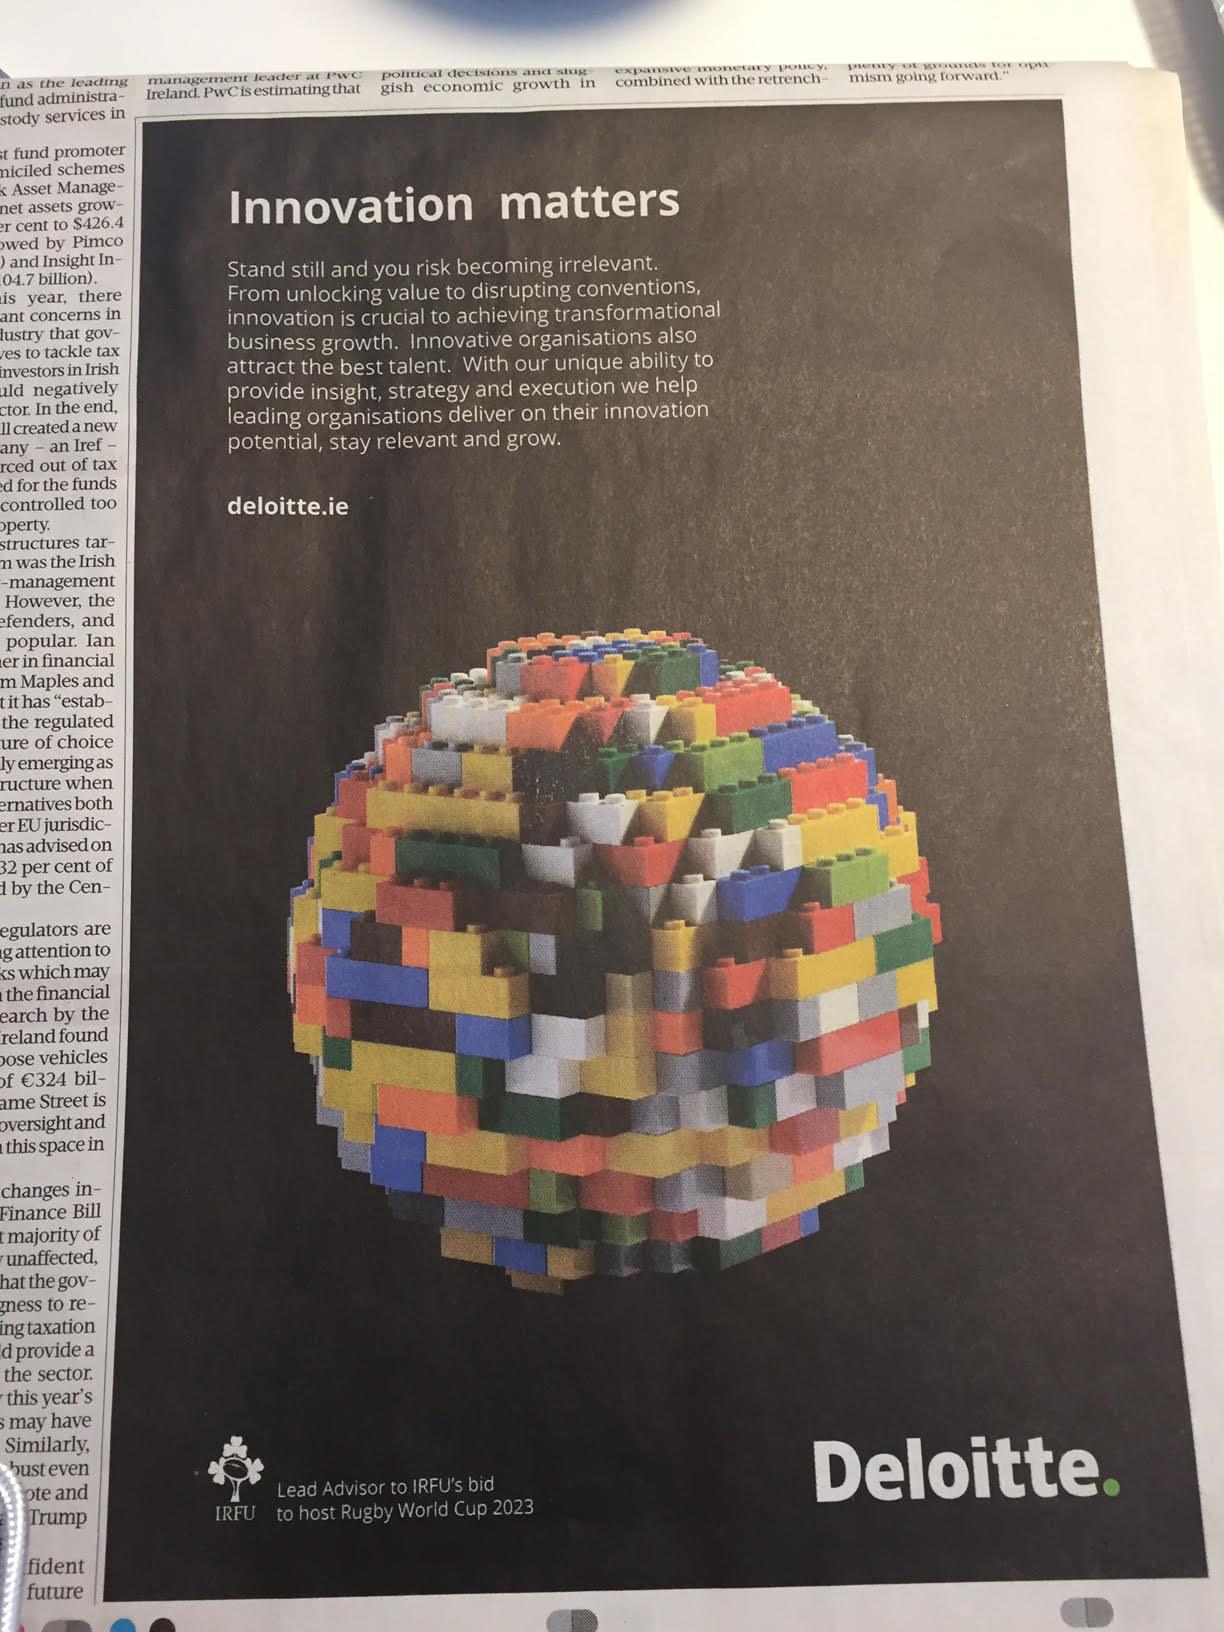 Deloitte – Innovation matters